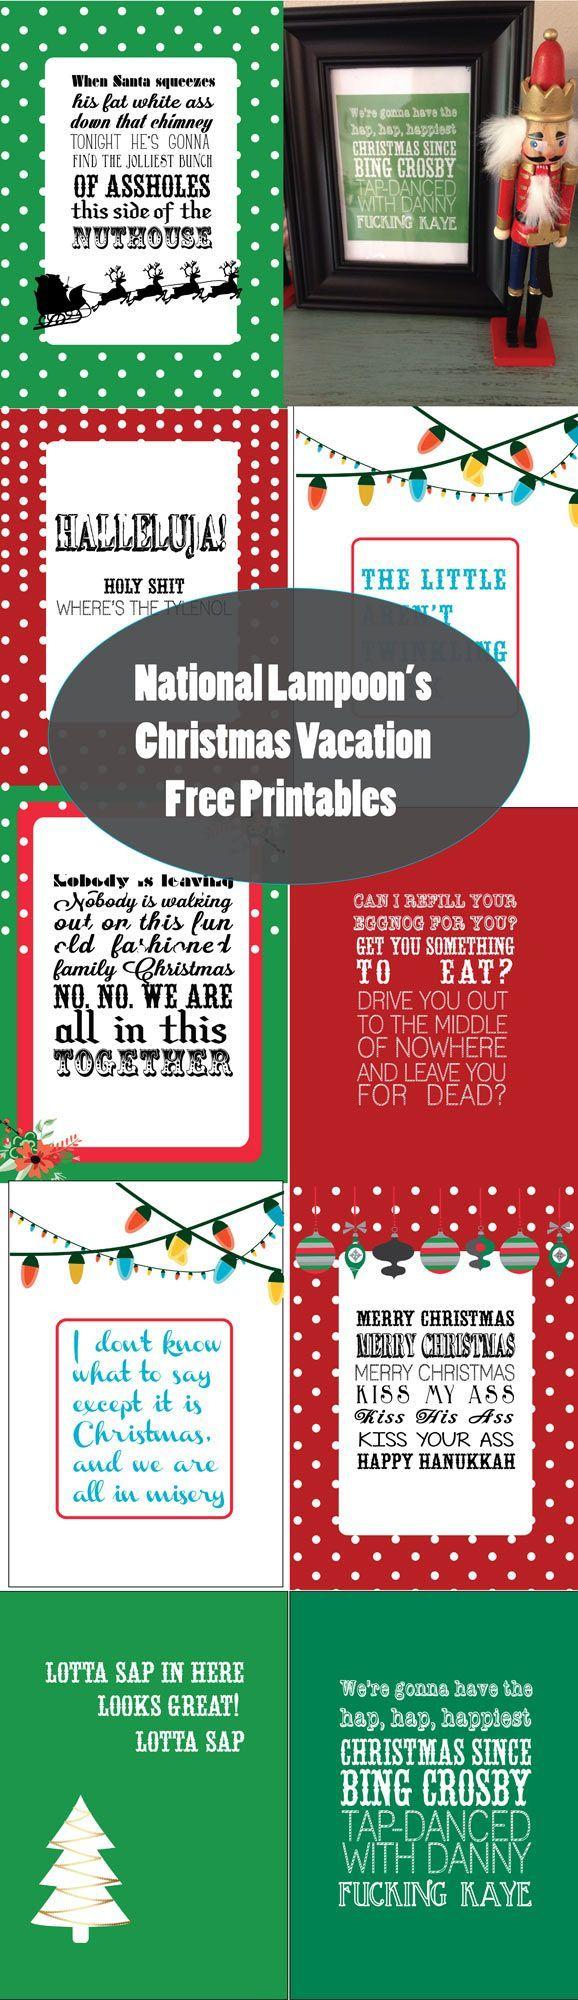 National Lampoons Christmas Vacation Free Printables